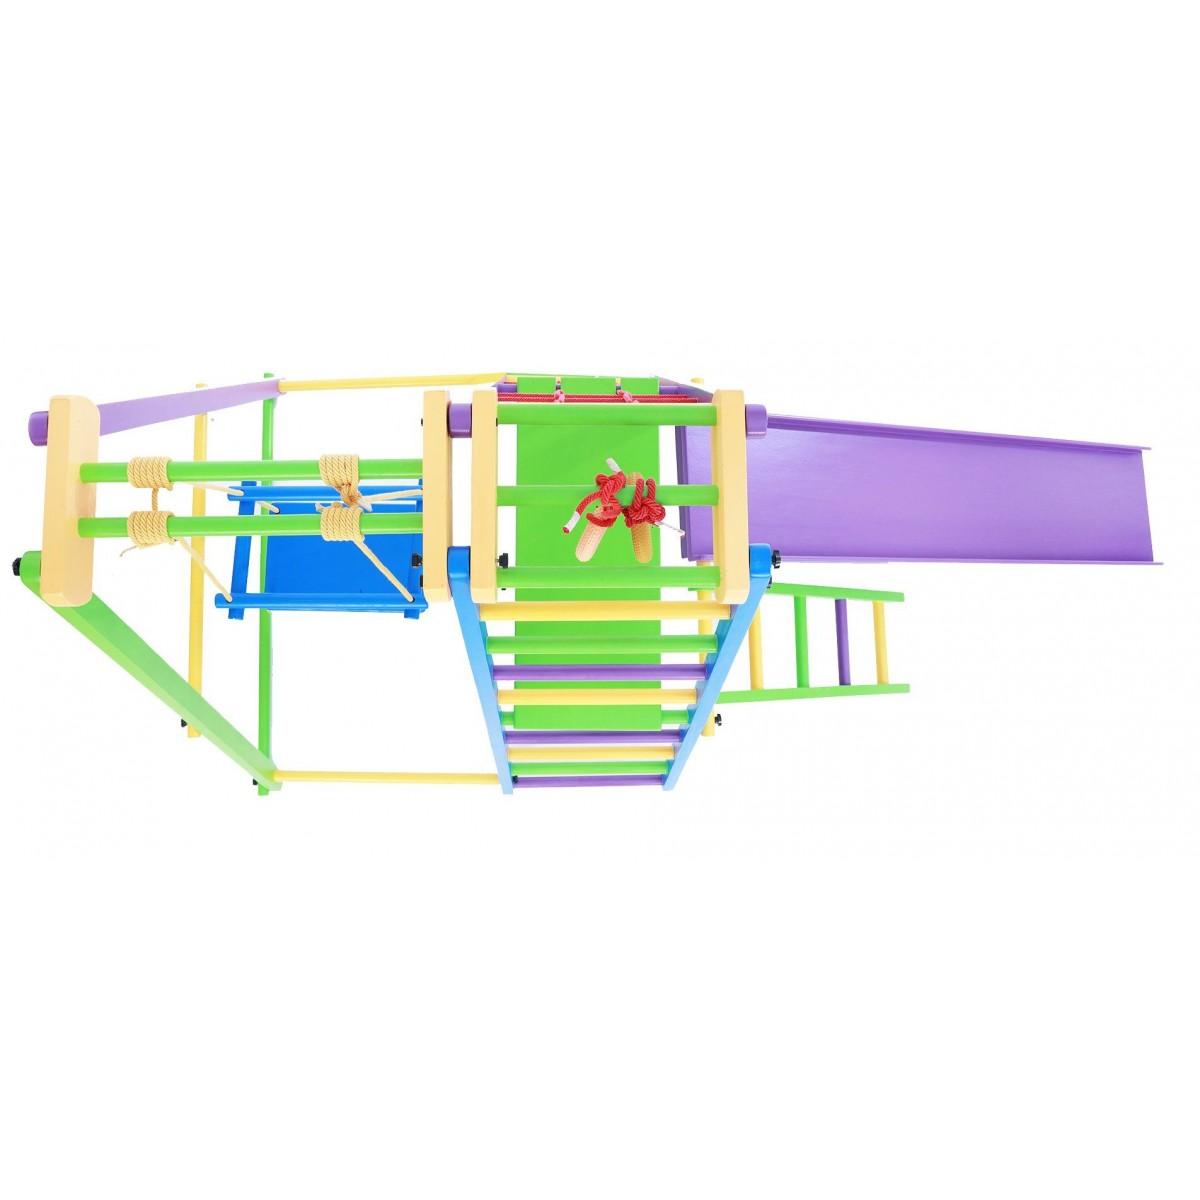 Jungle Gym 2.0 - Colored